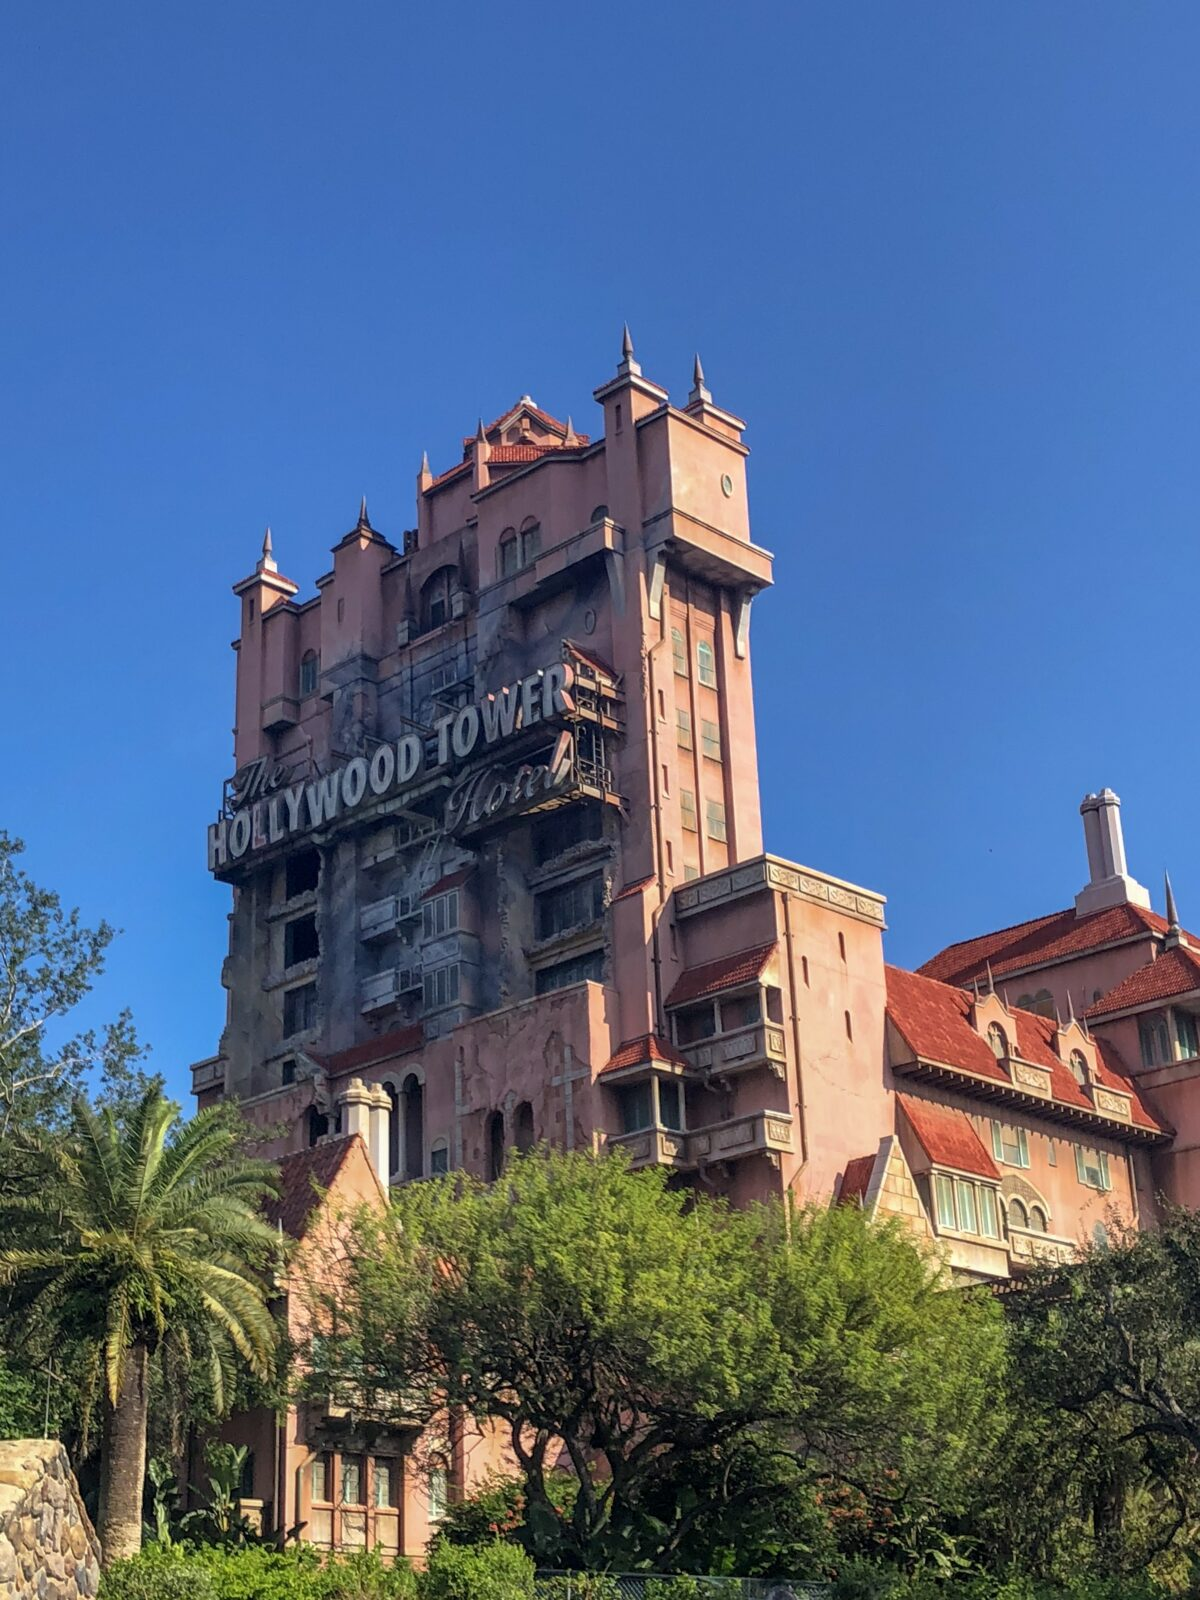 disney world, hollywood studios, toy story land, tower of terror, walt disney world in one day